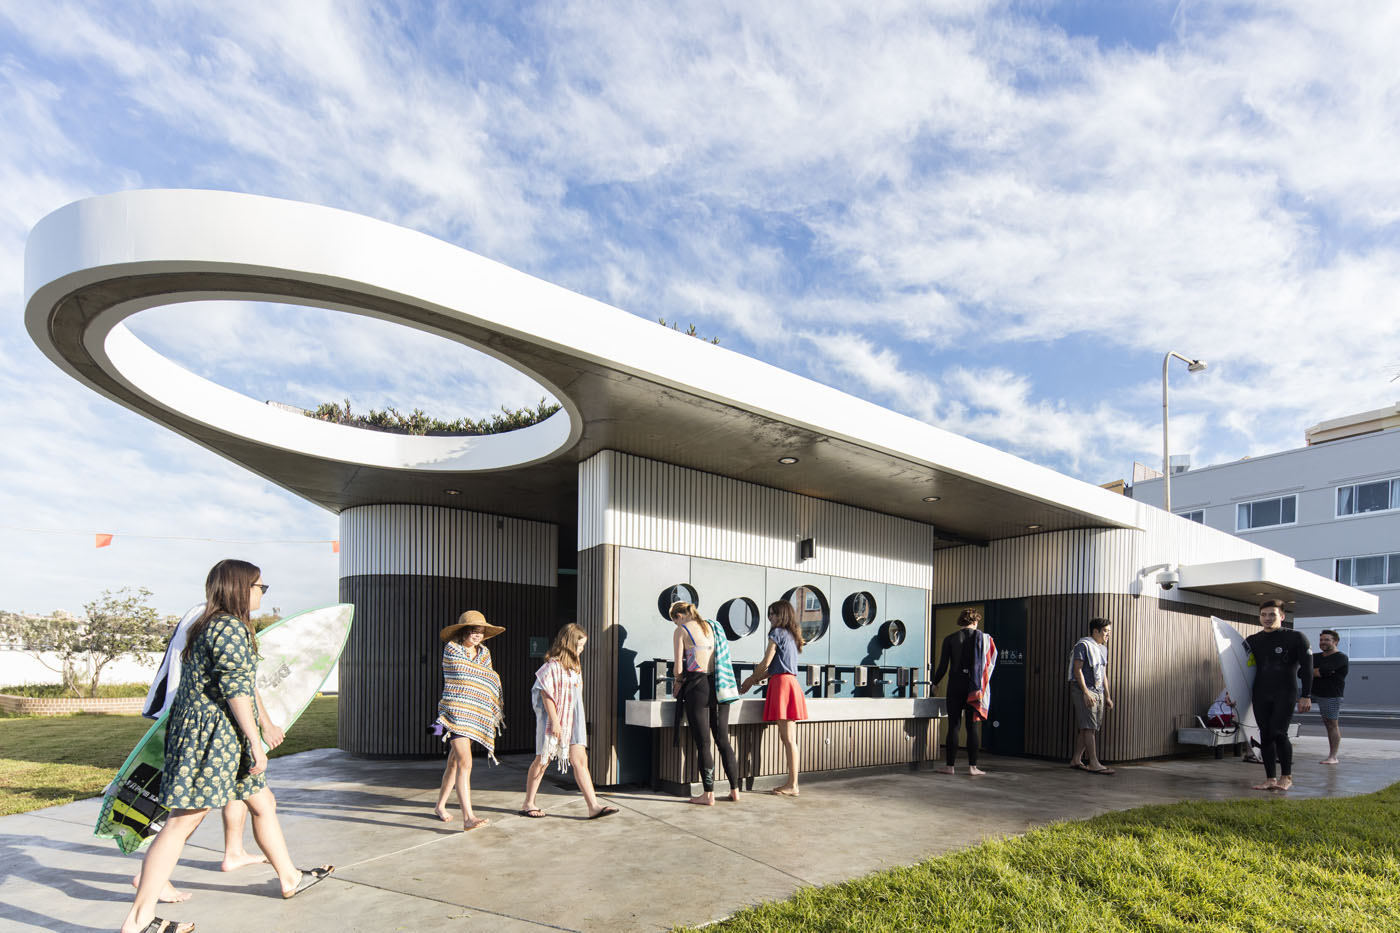 North Bondi Amenities, a public project by award winning Sam Crawford Architects. Hand wash basin in use.